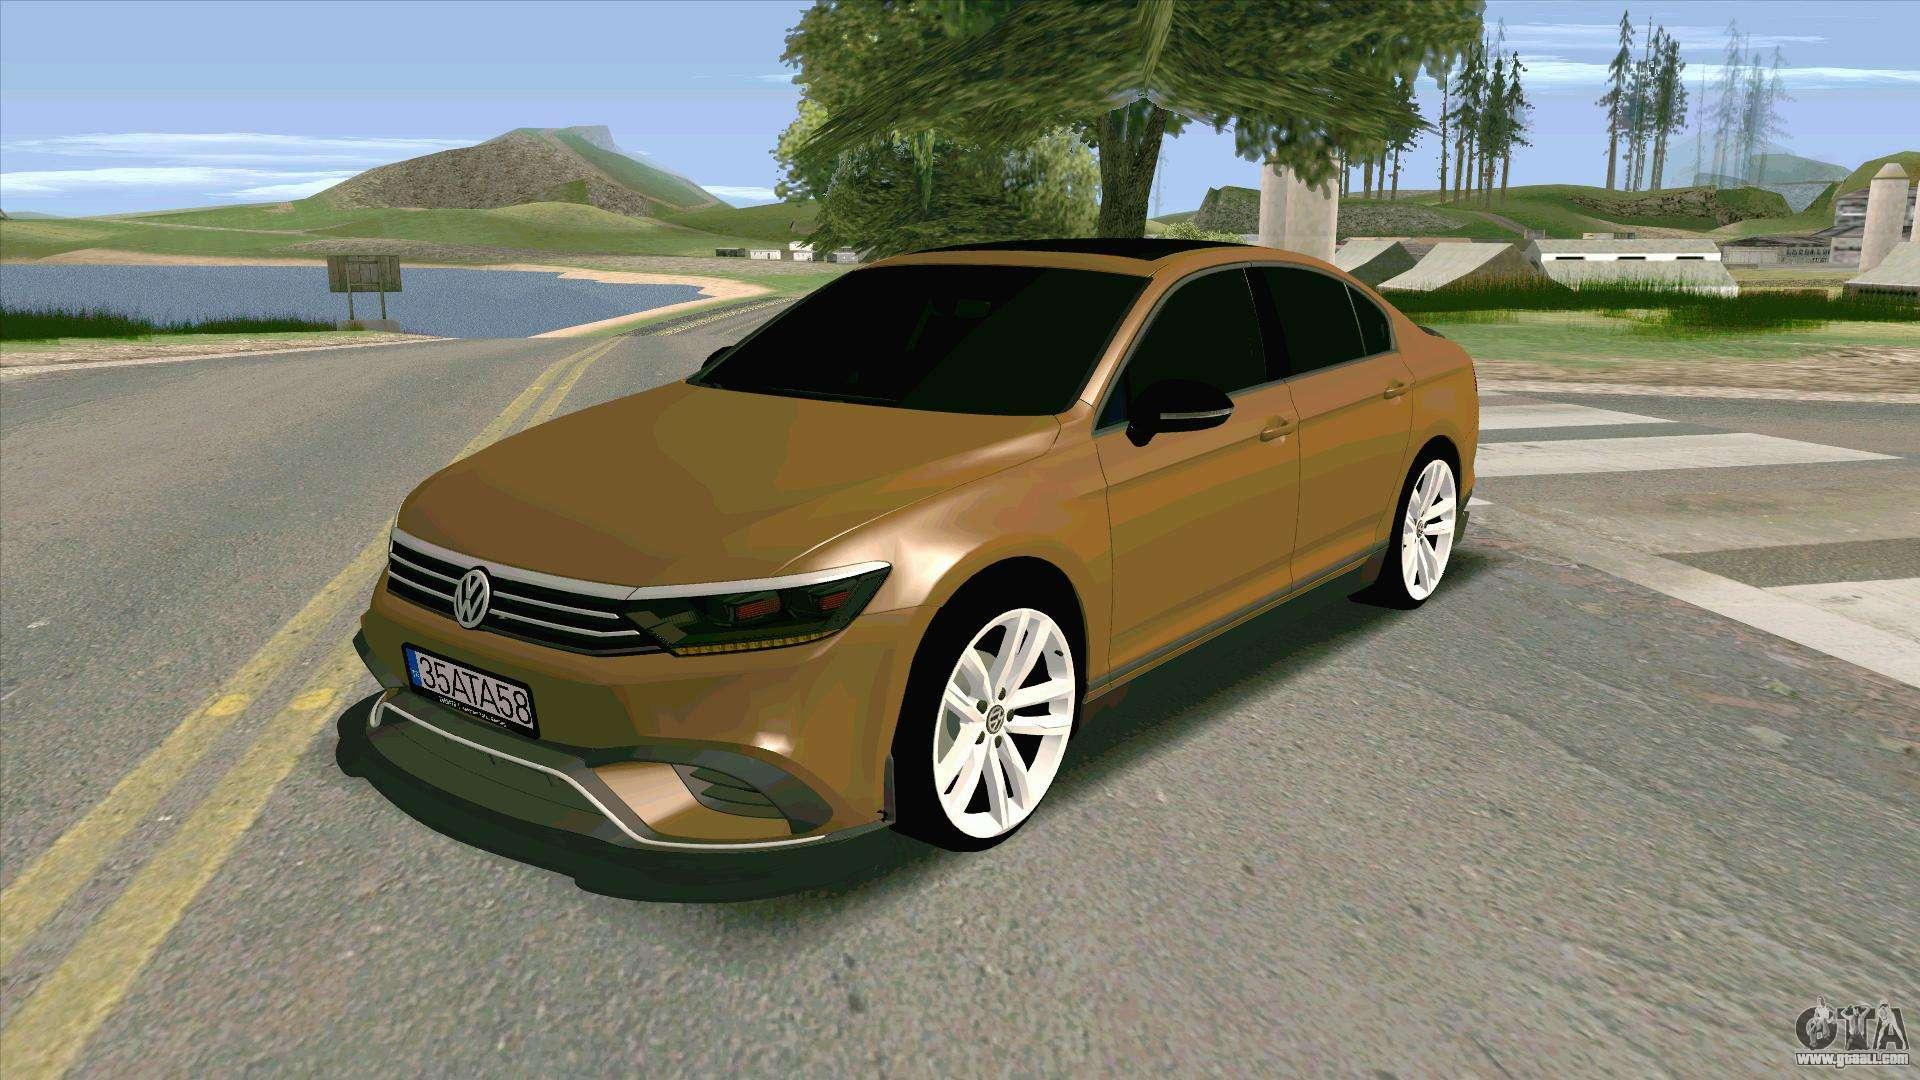 Volkswagen Passat B8 Turkiye For Gta San Andreas